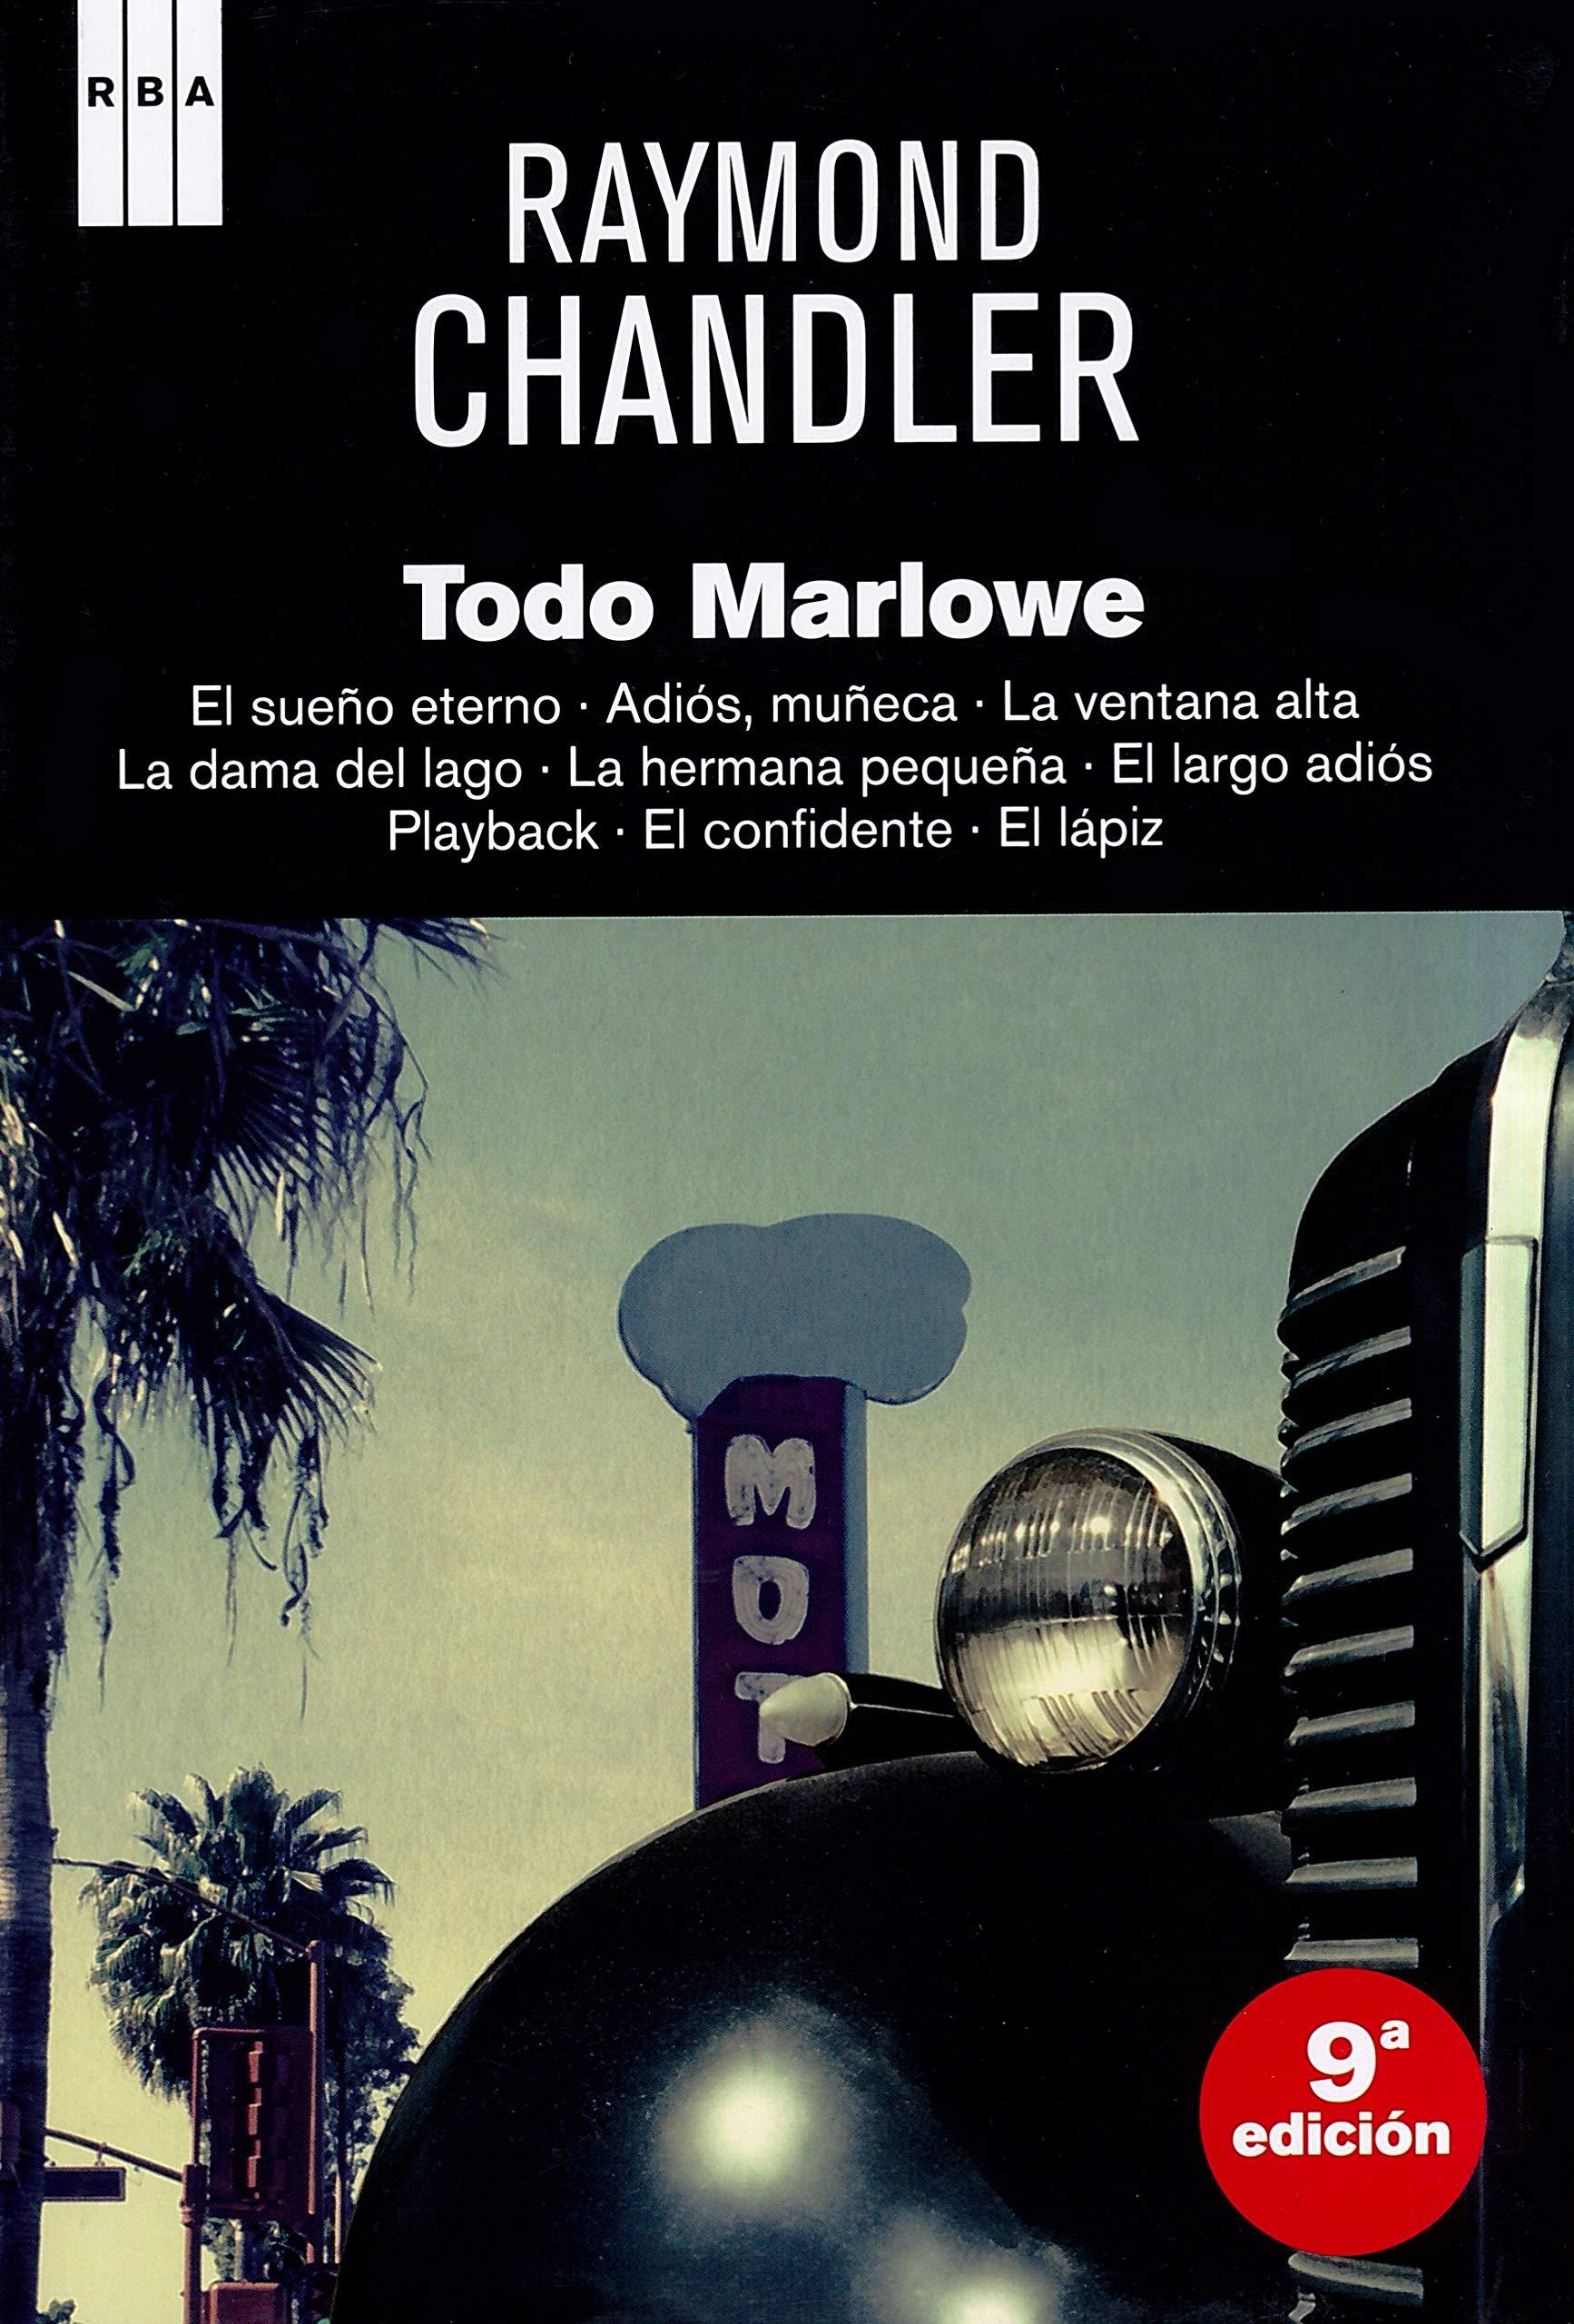 Todo marlowe (ÓMNIBUS): Amazon.es: Chandler, Raymond, LOPEZ MUÑOZ ...